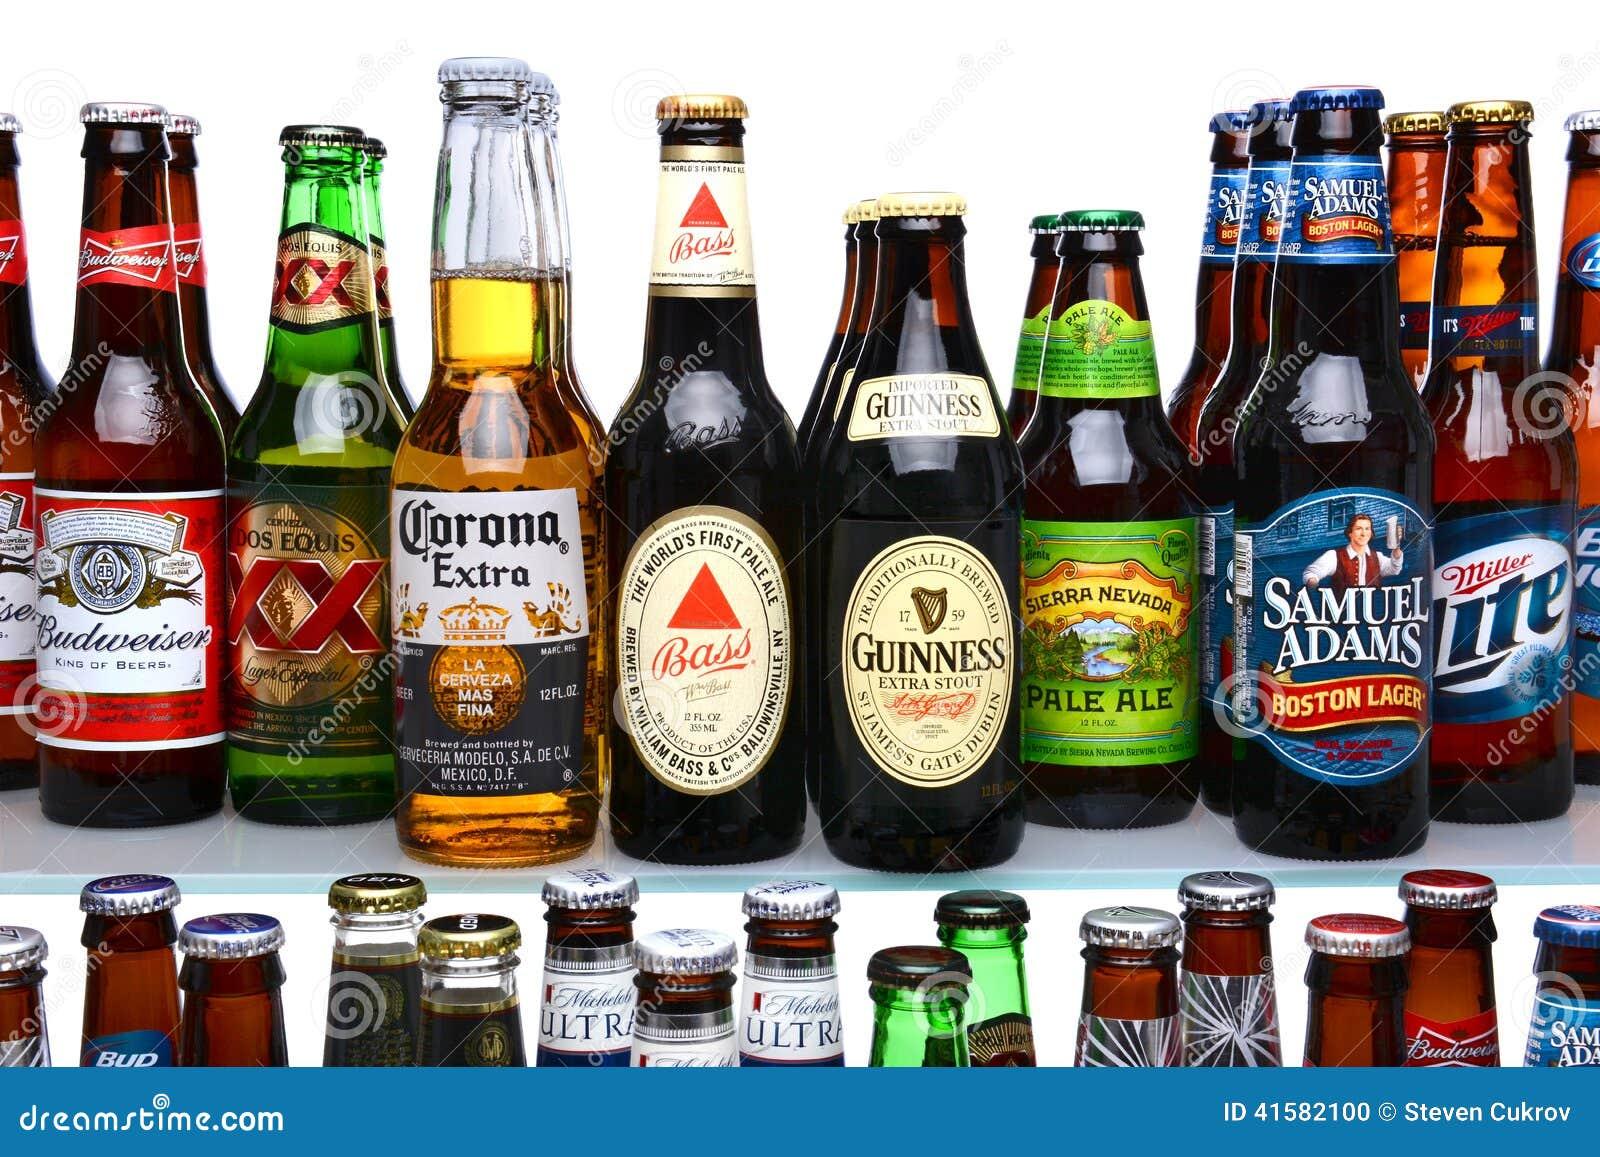 of beer brands on shelves  Z Beer Brands